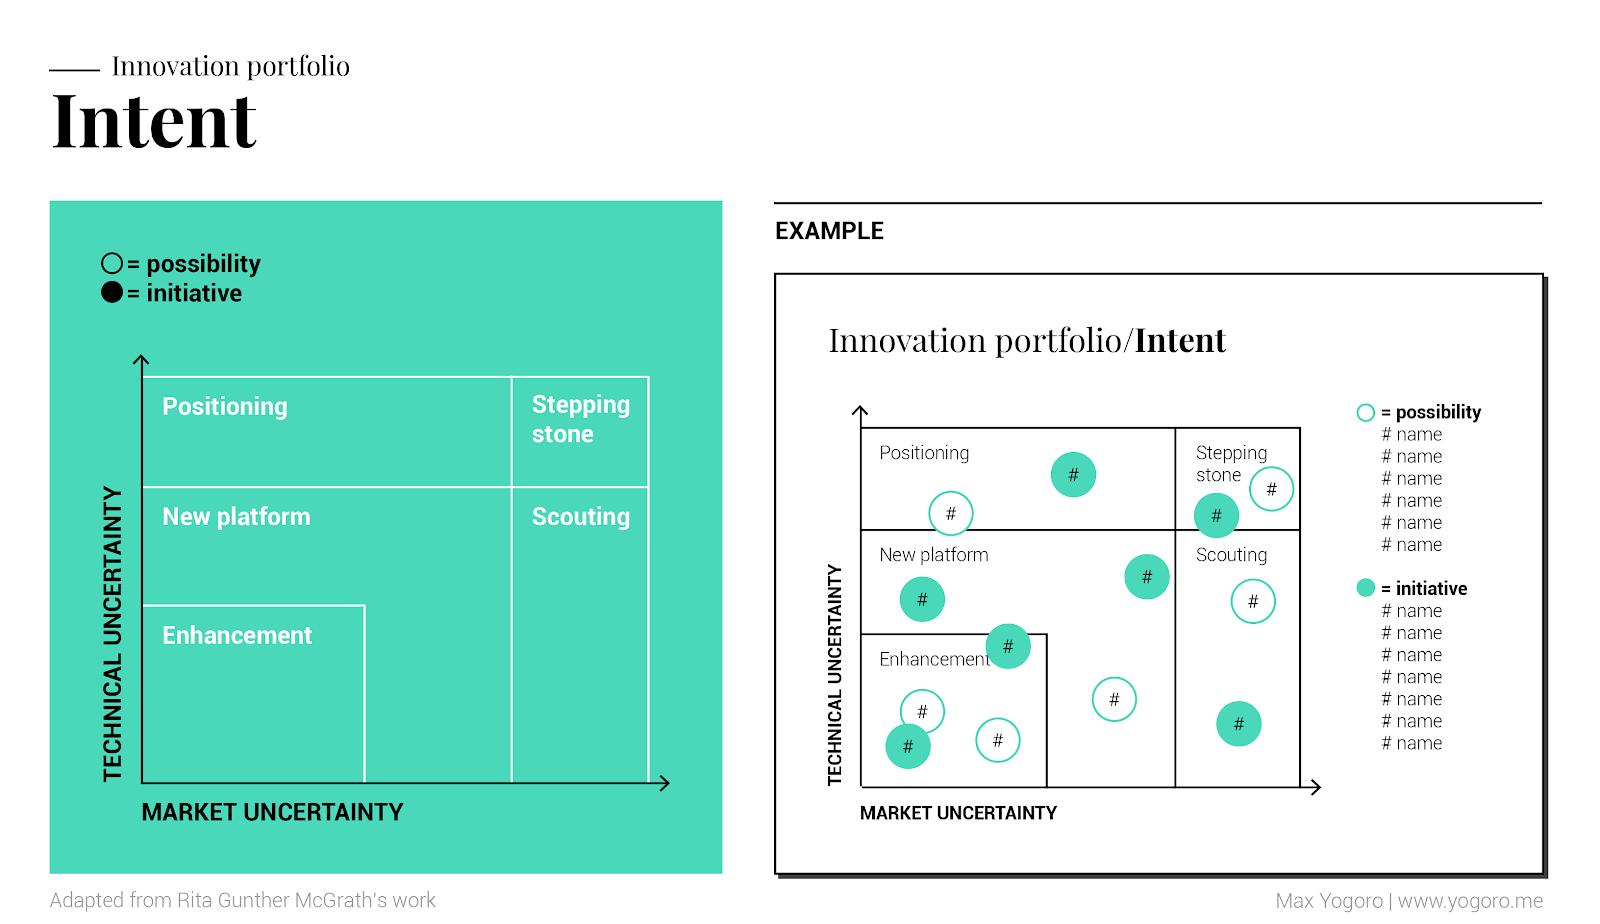 screenshot of innovation portfolio